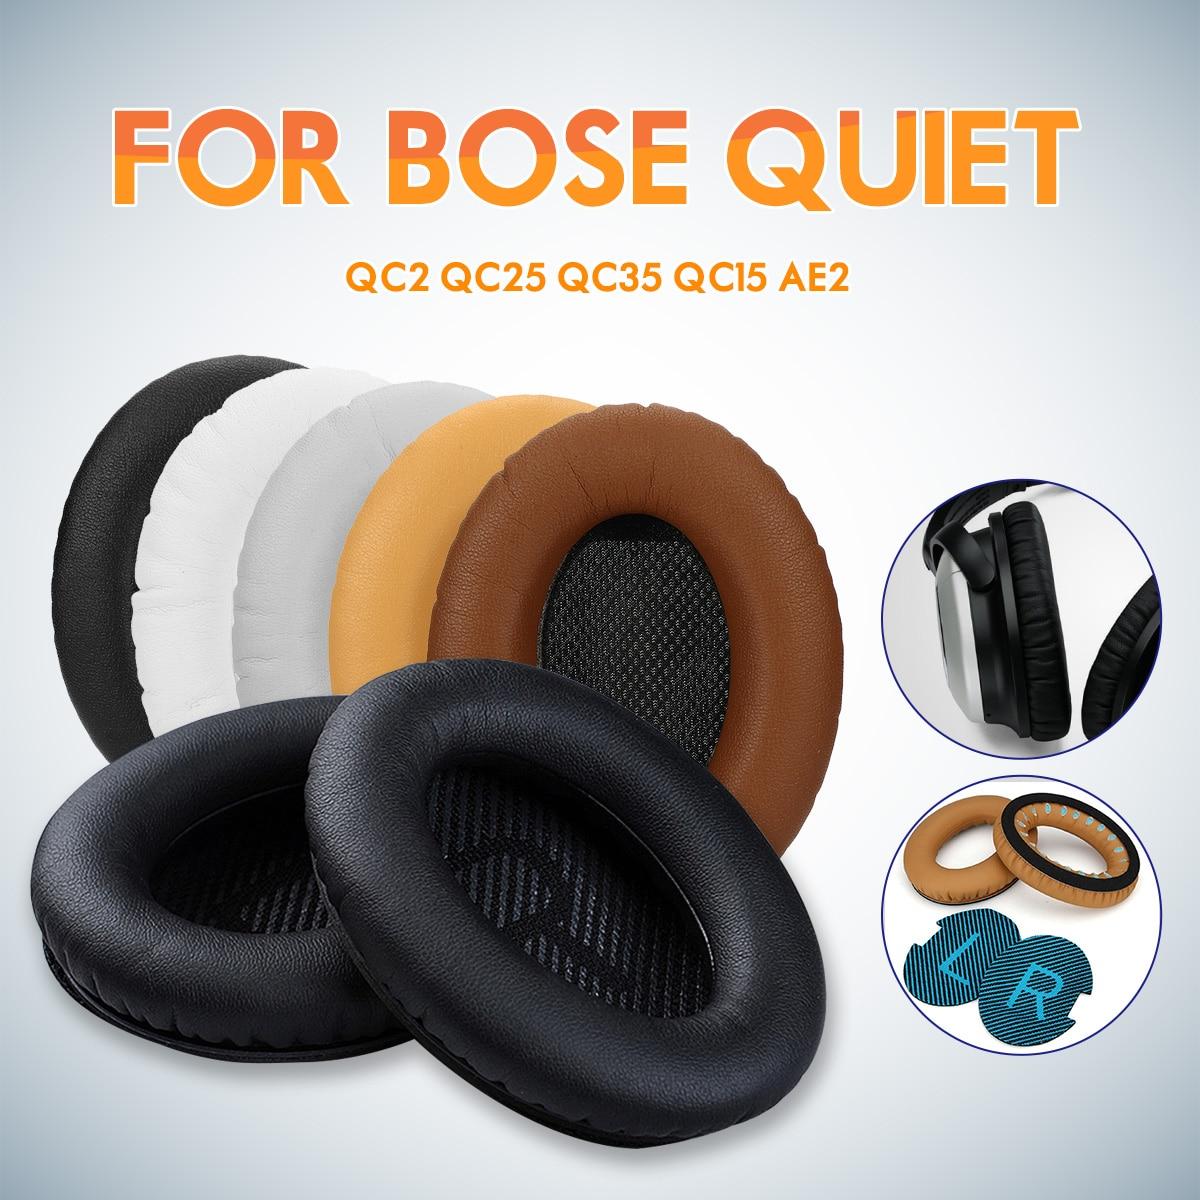 White Bose Around-Ear 2 AE2 Headphones Ear Pads Leather Over Ear Cushion Kit